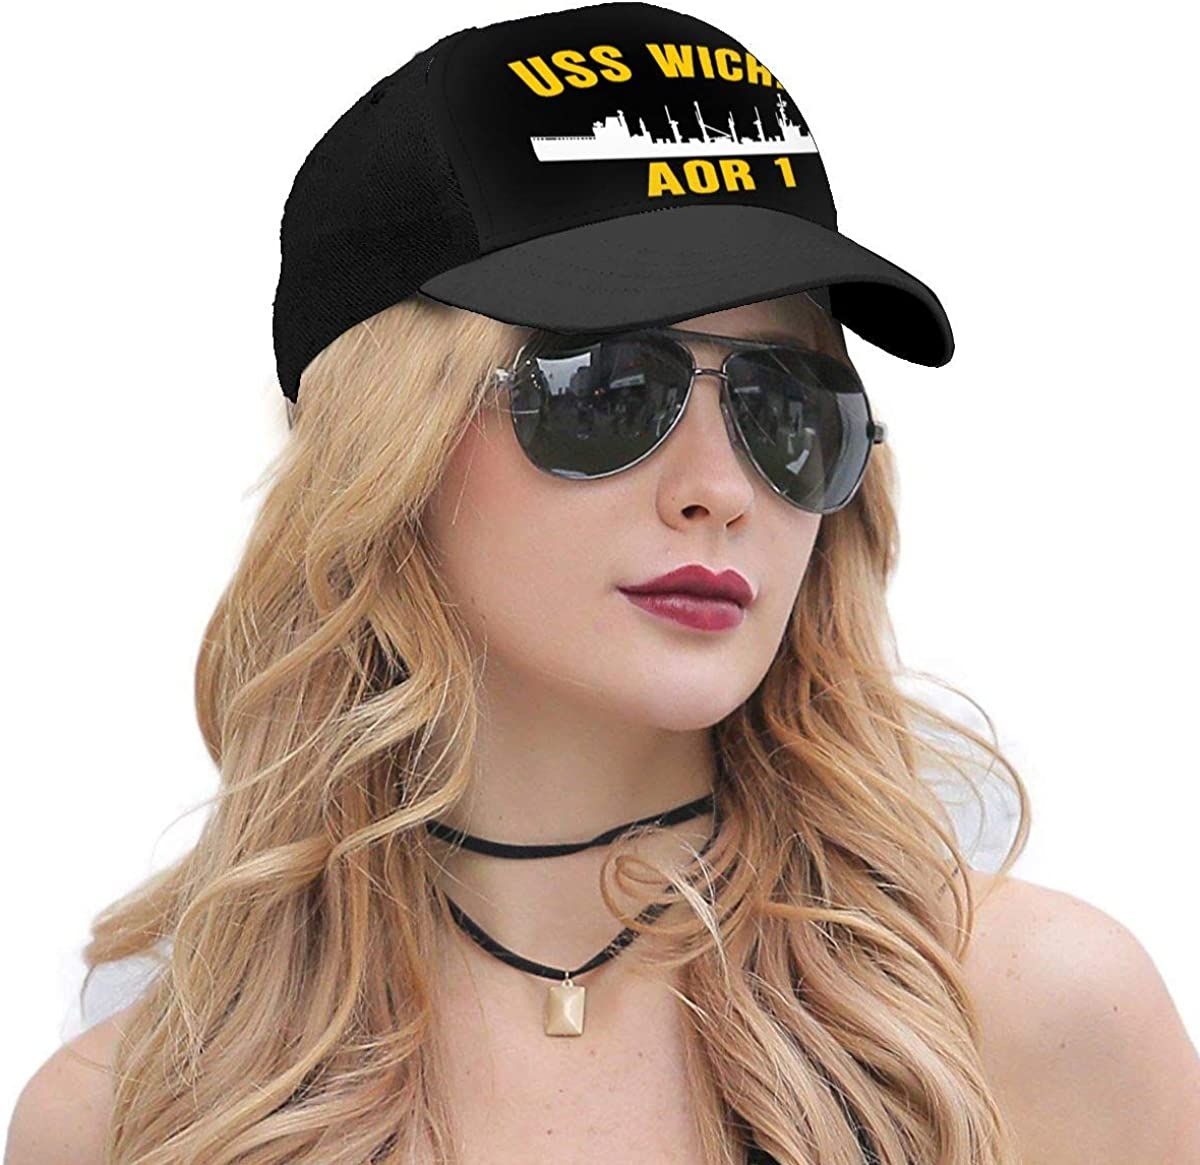 YOUNAOQQ USS OBannon Dd 987 Unisex Baseball Cap Adjustable Hats Dad Hat Cap Sports Hat